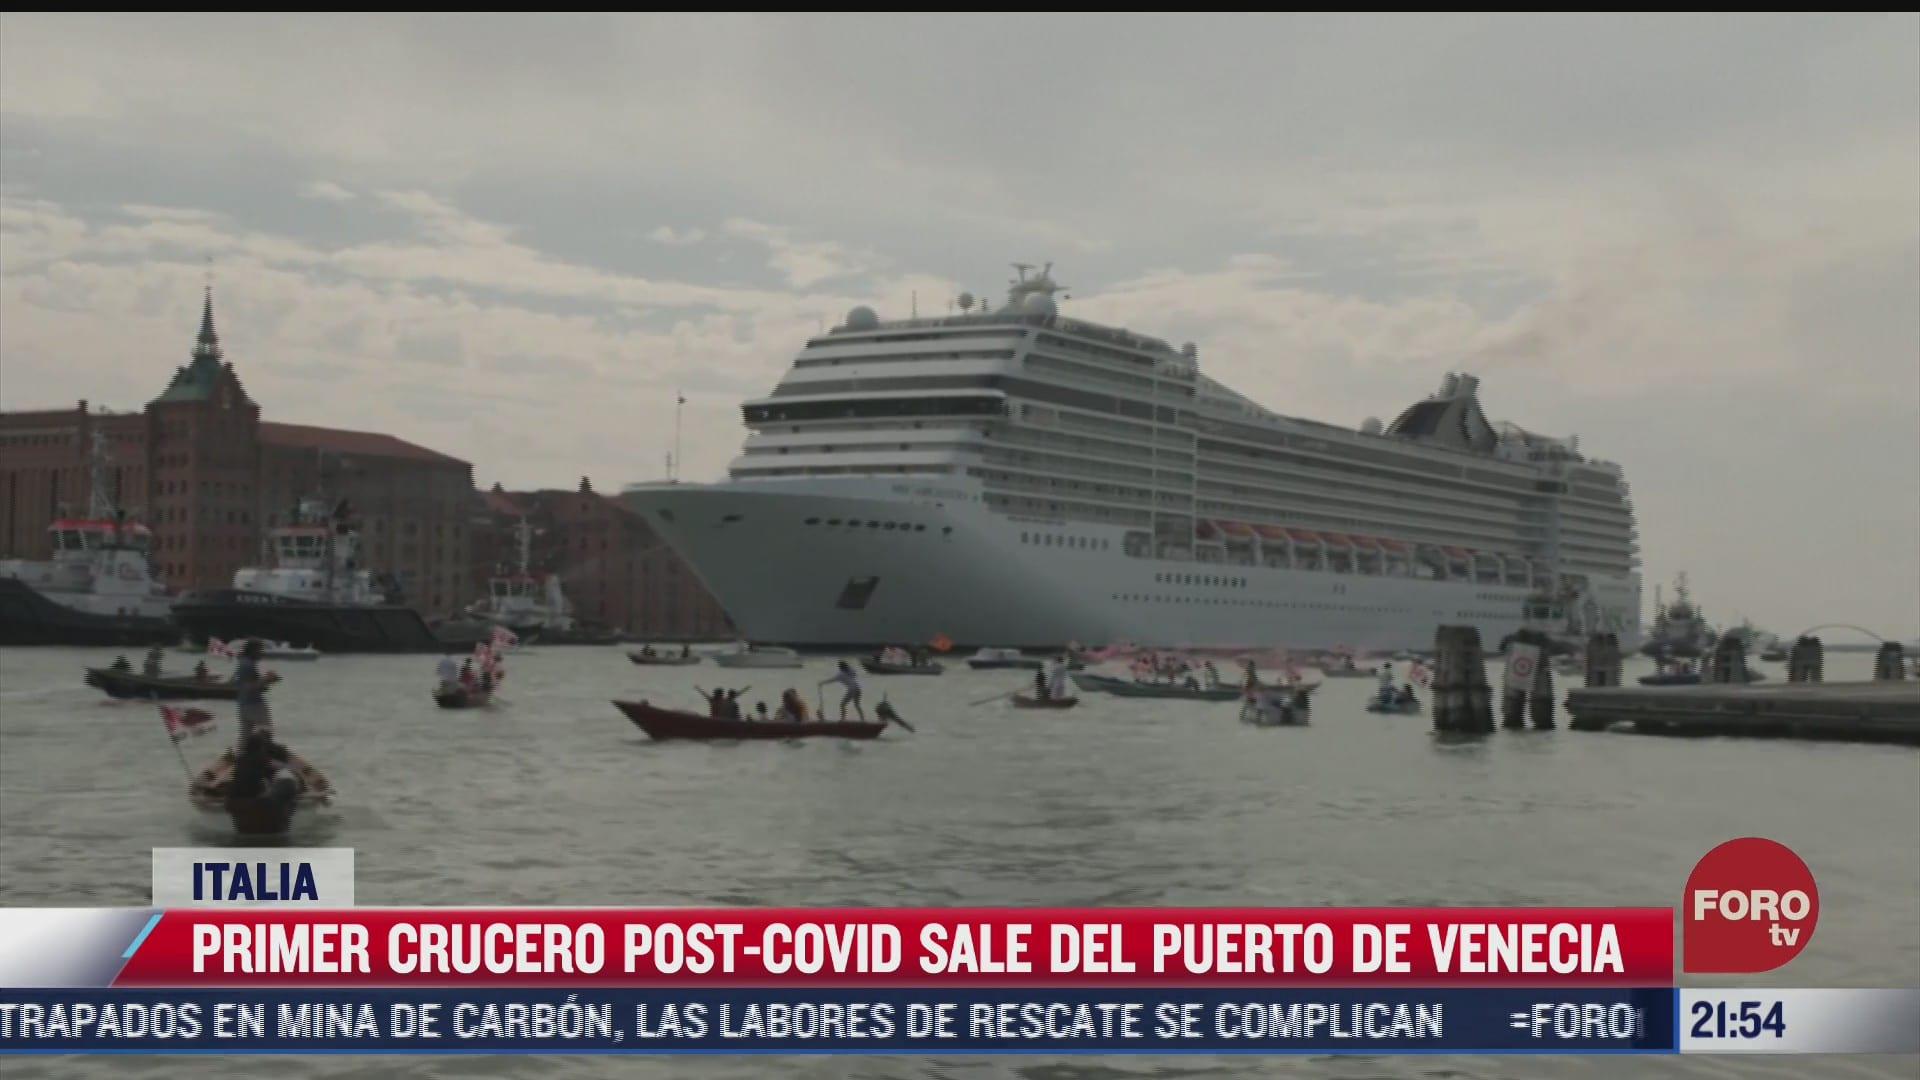 primer crucero post covid sale del puerto de venecia italia